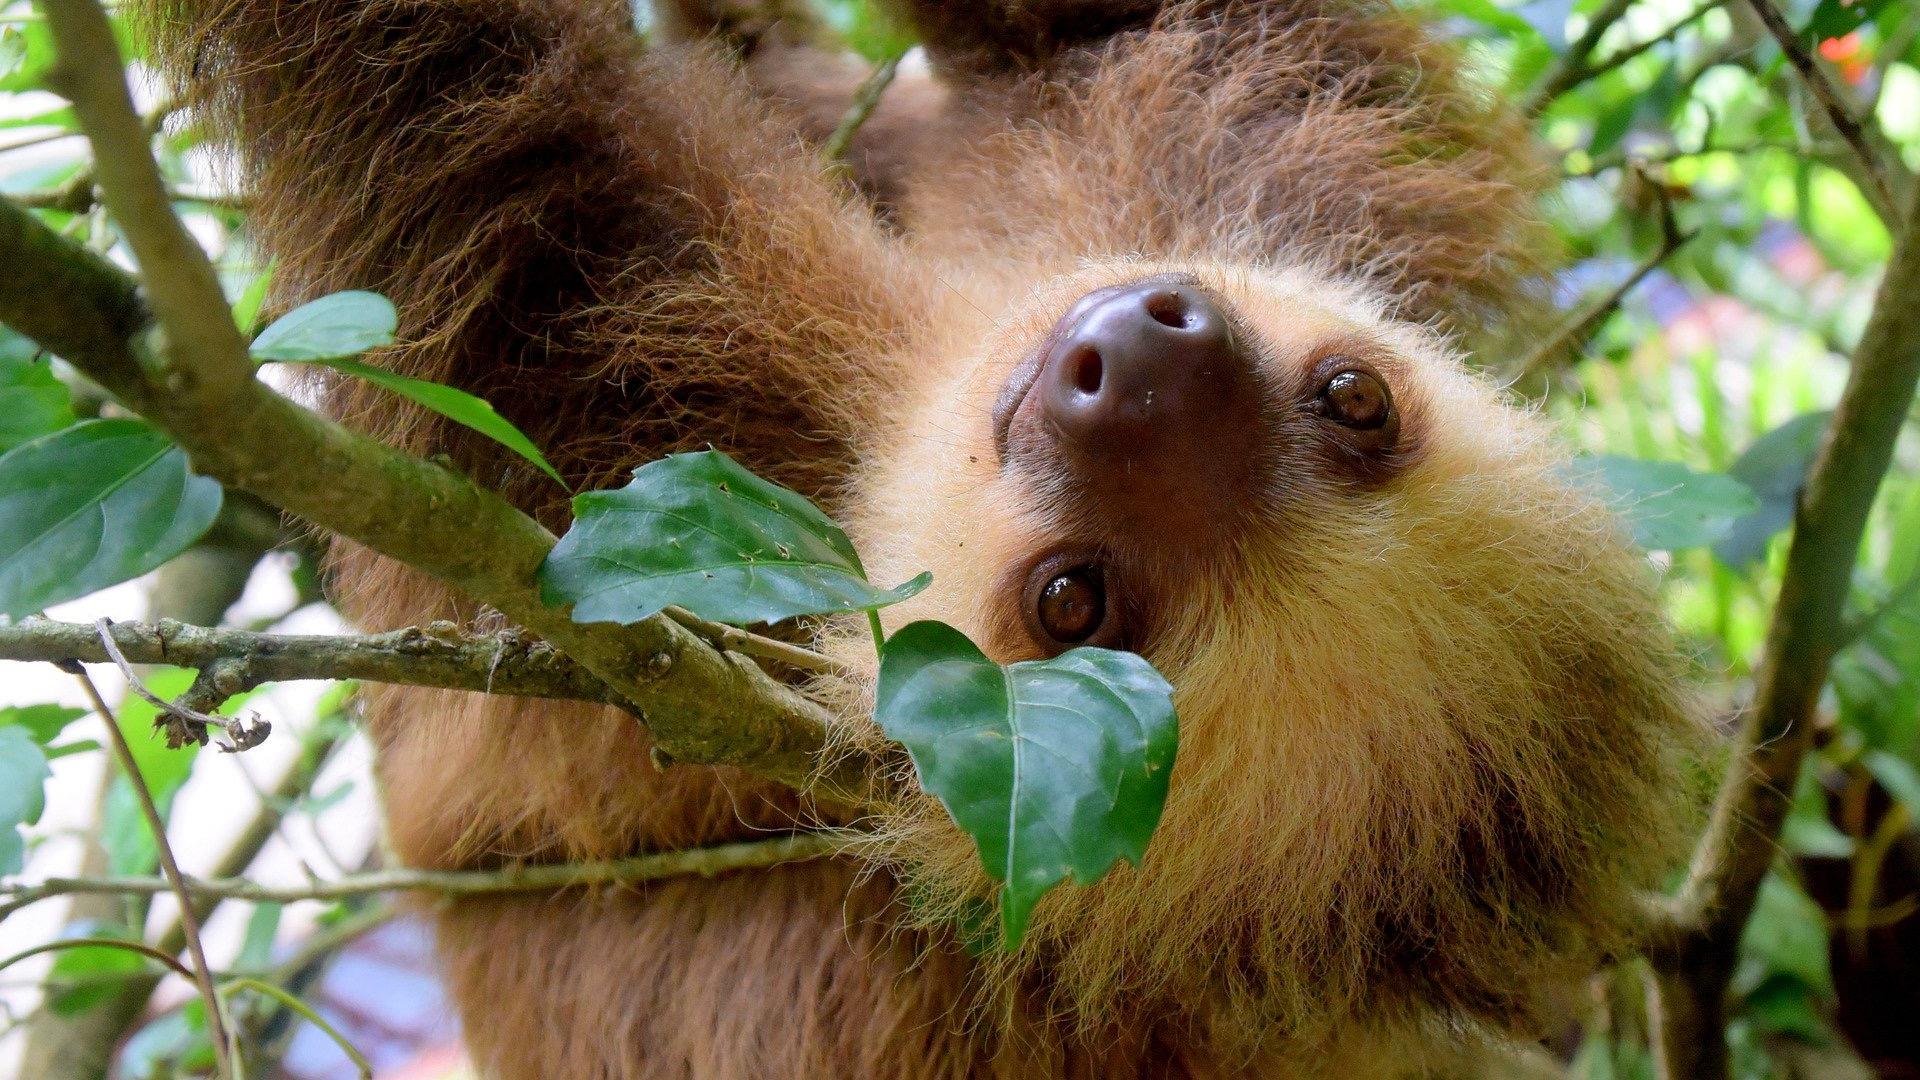 Image: Sloth smiling